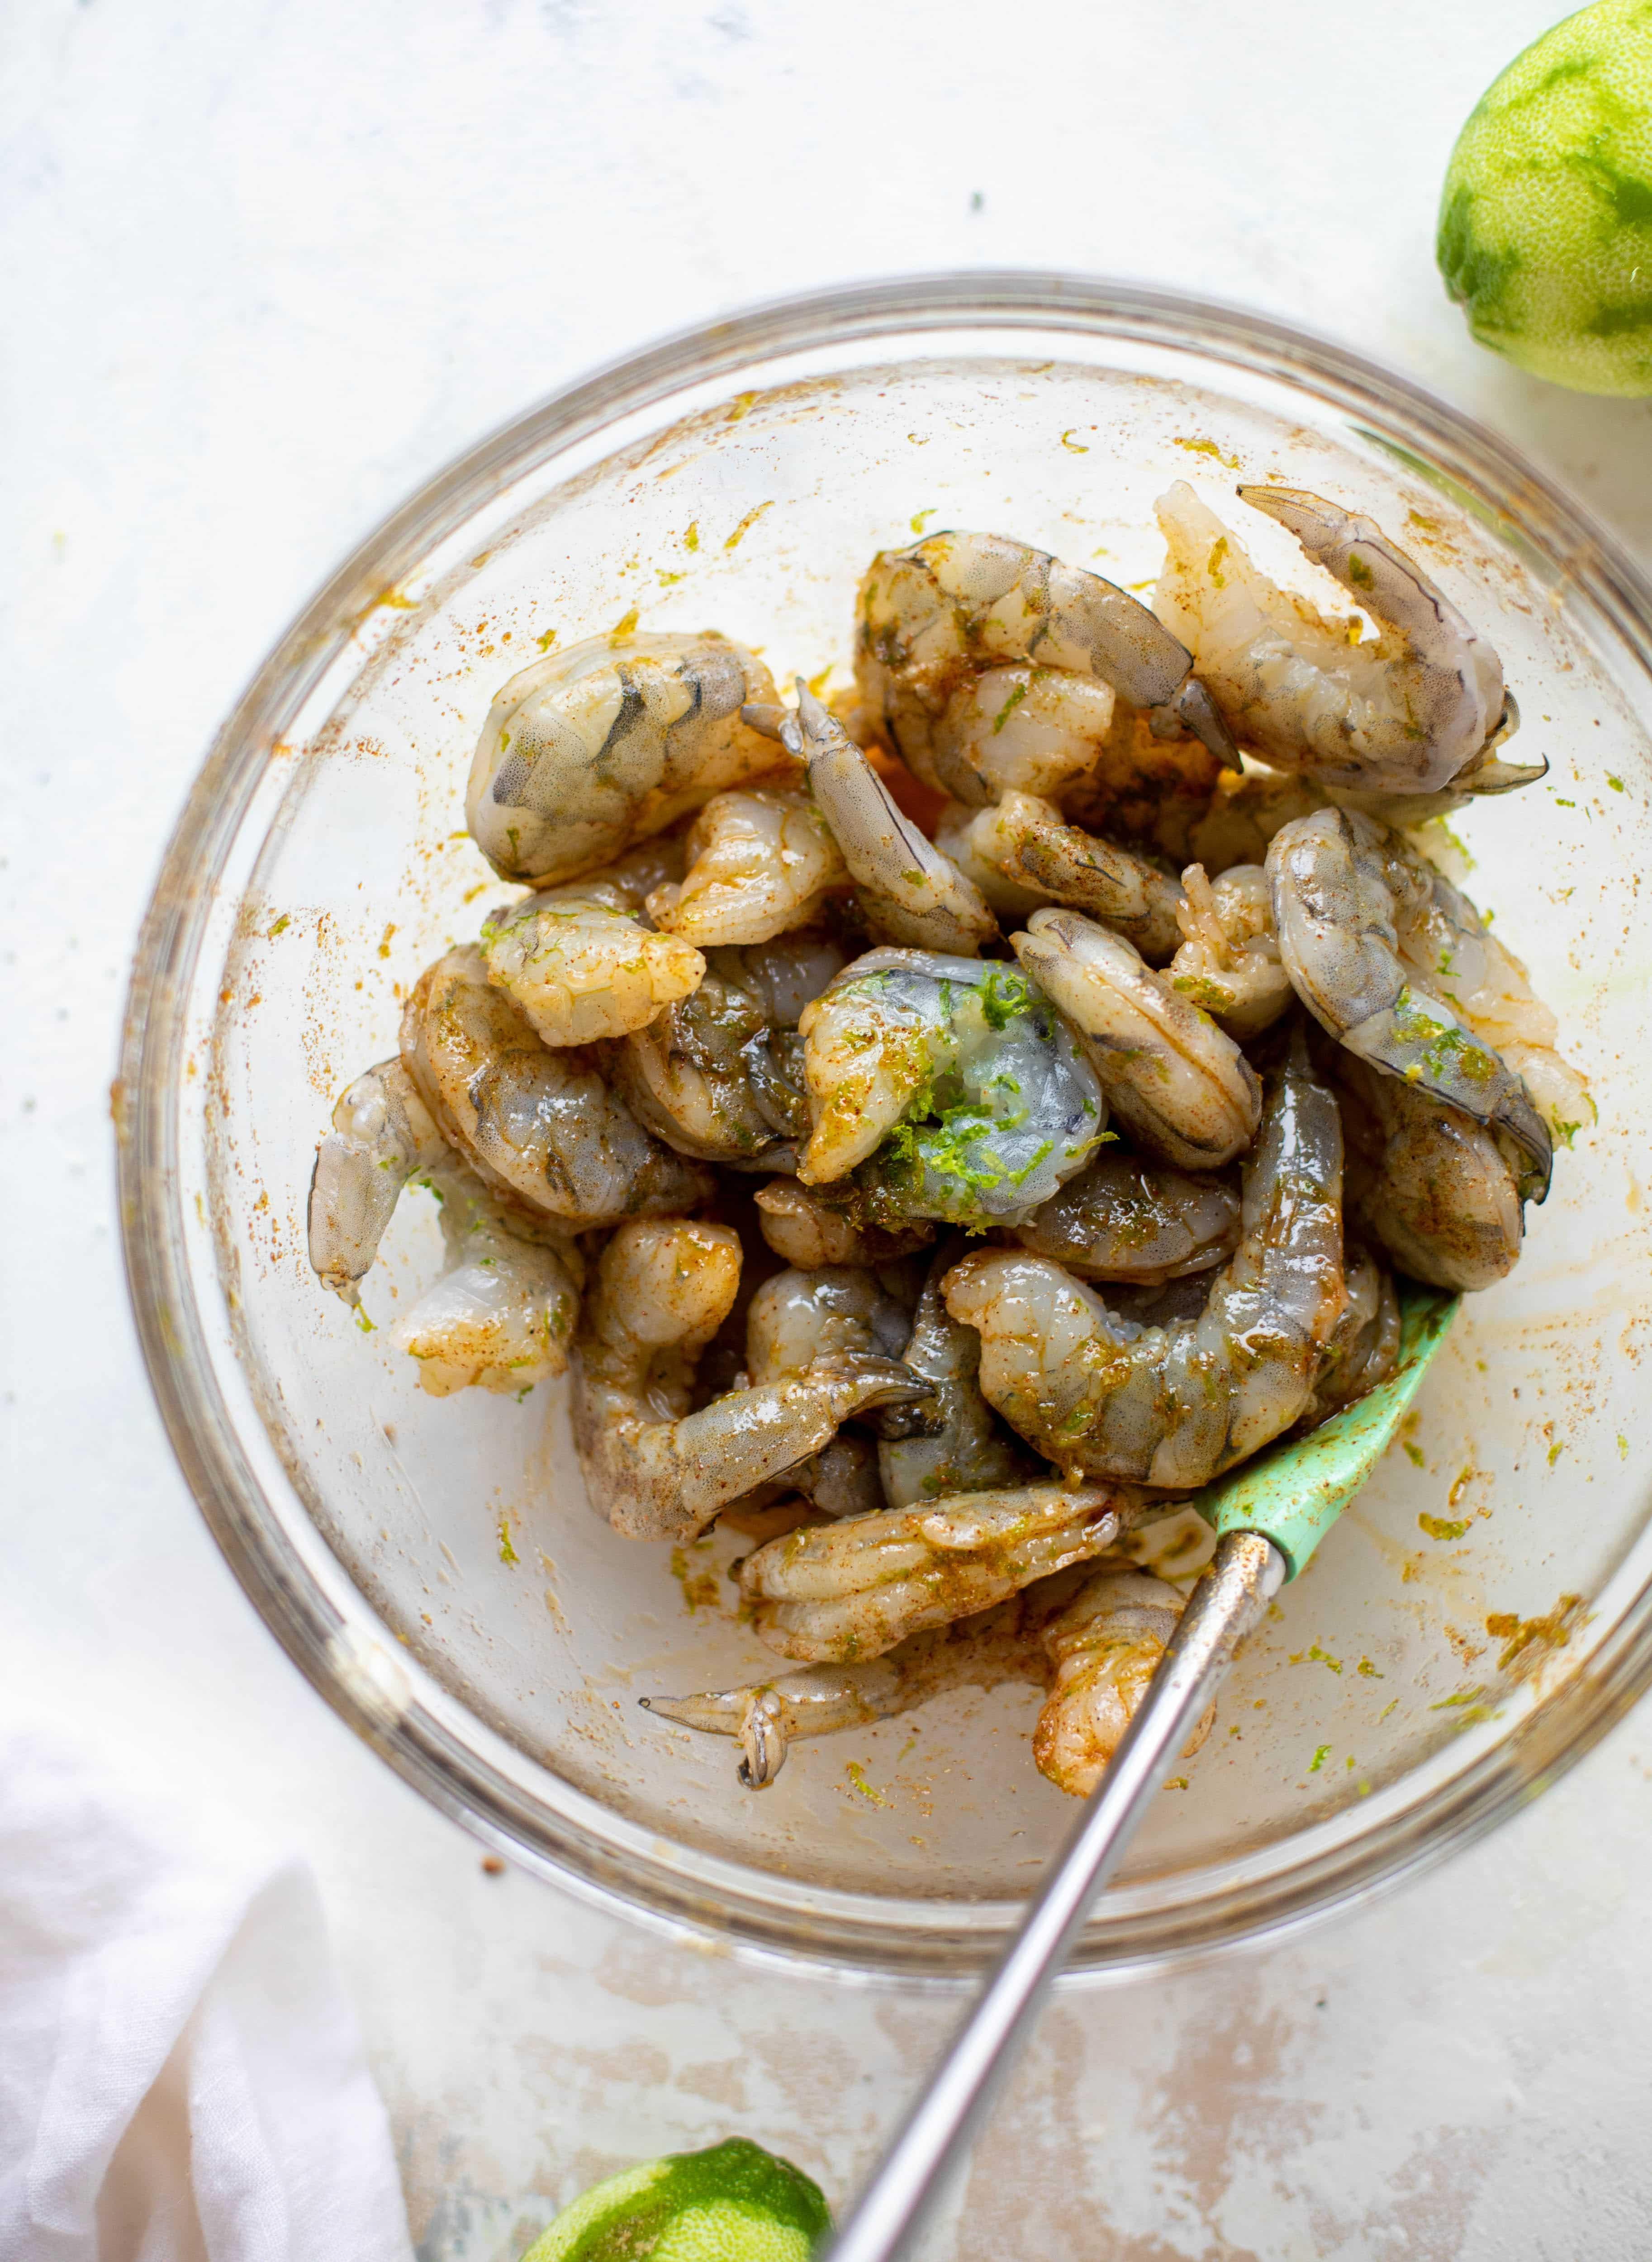 lime marinated shrimp